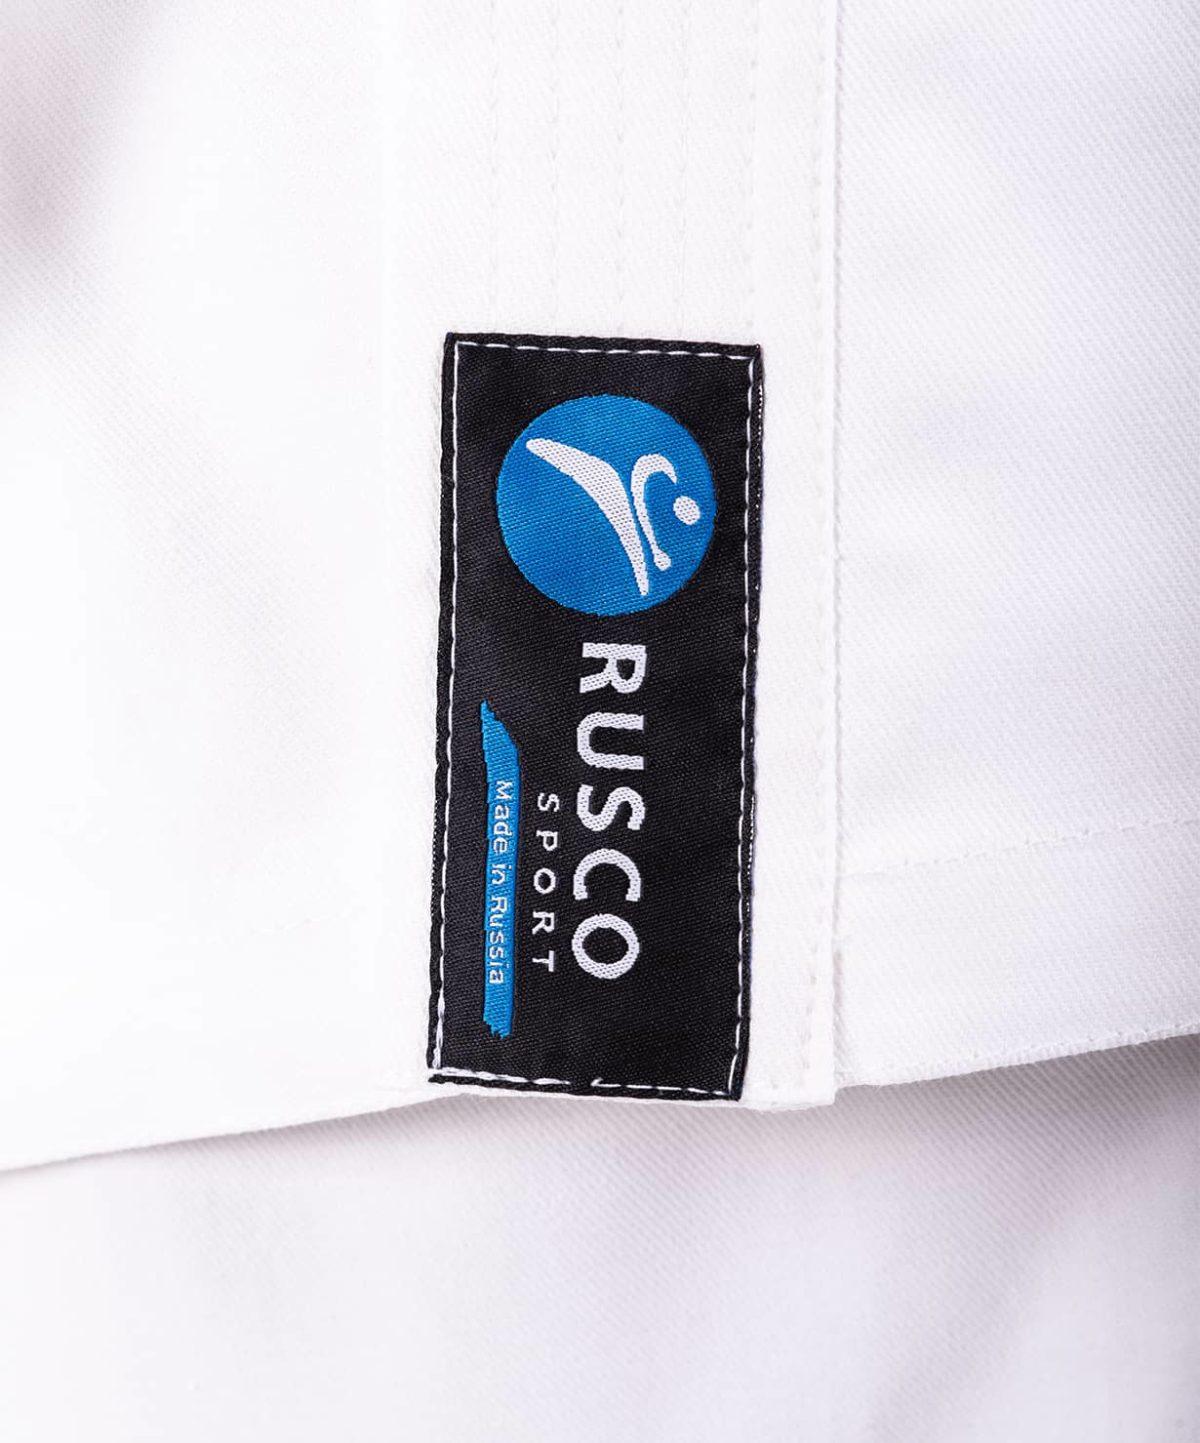 RUSCO Кимоно для рукопашного боя 5/180 Classic  17242 - 3